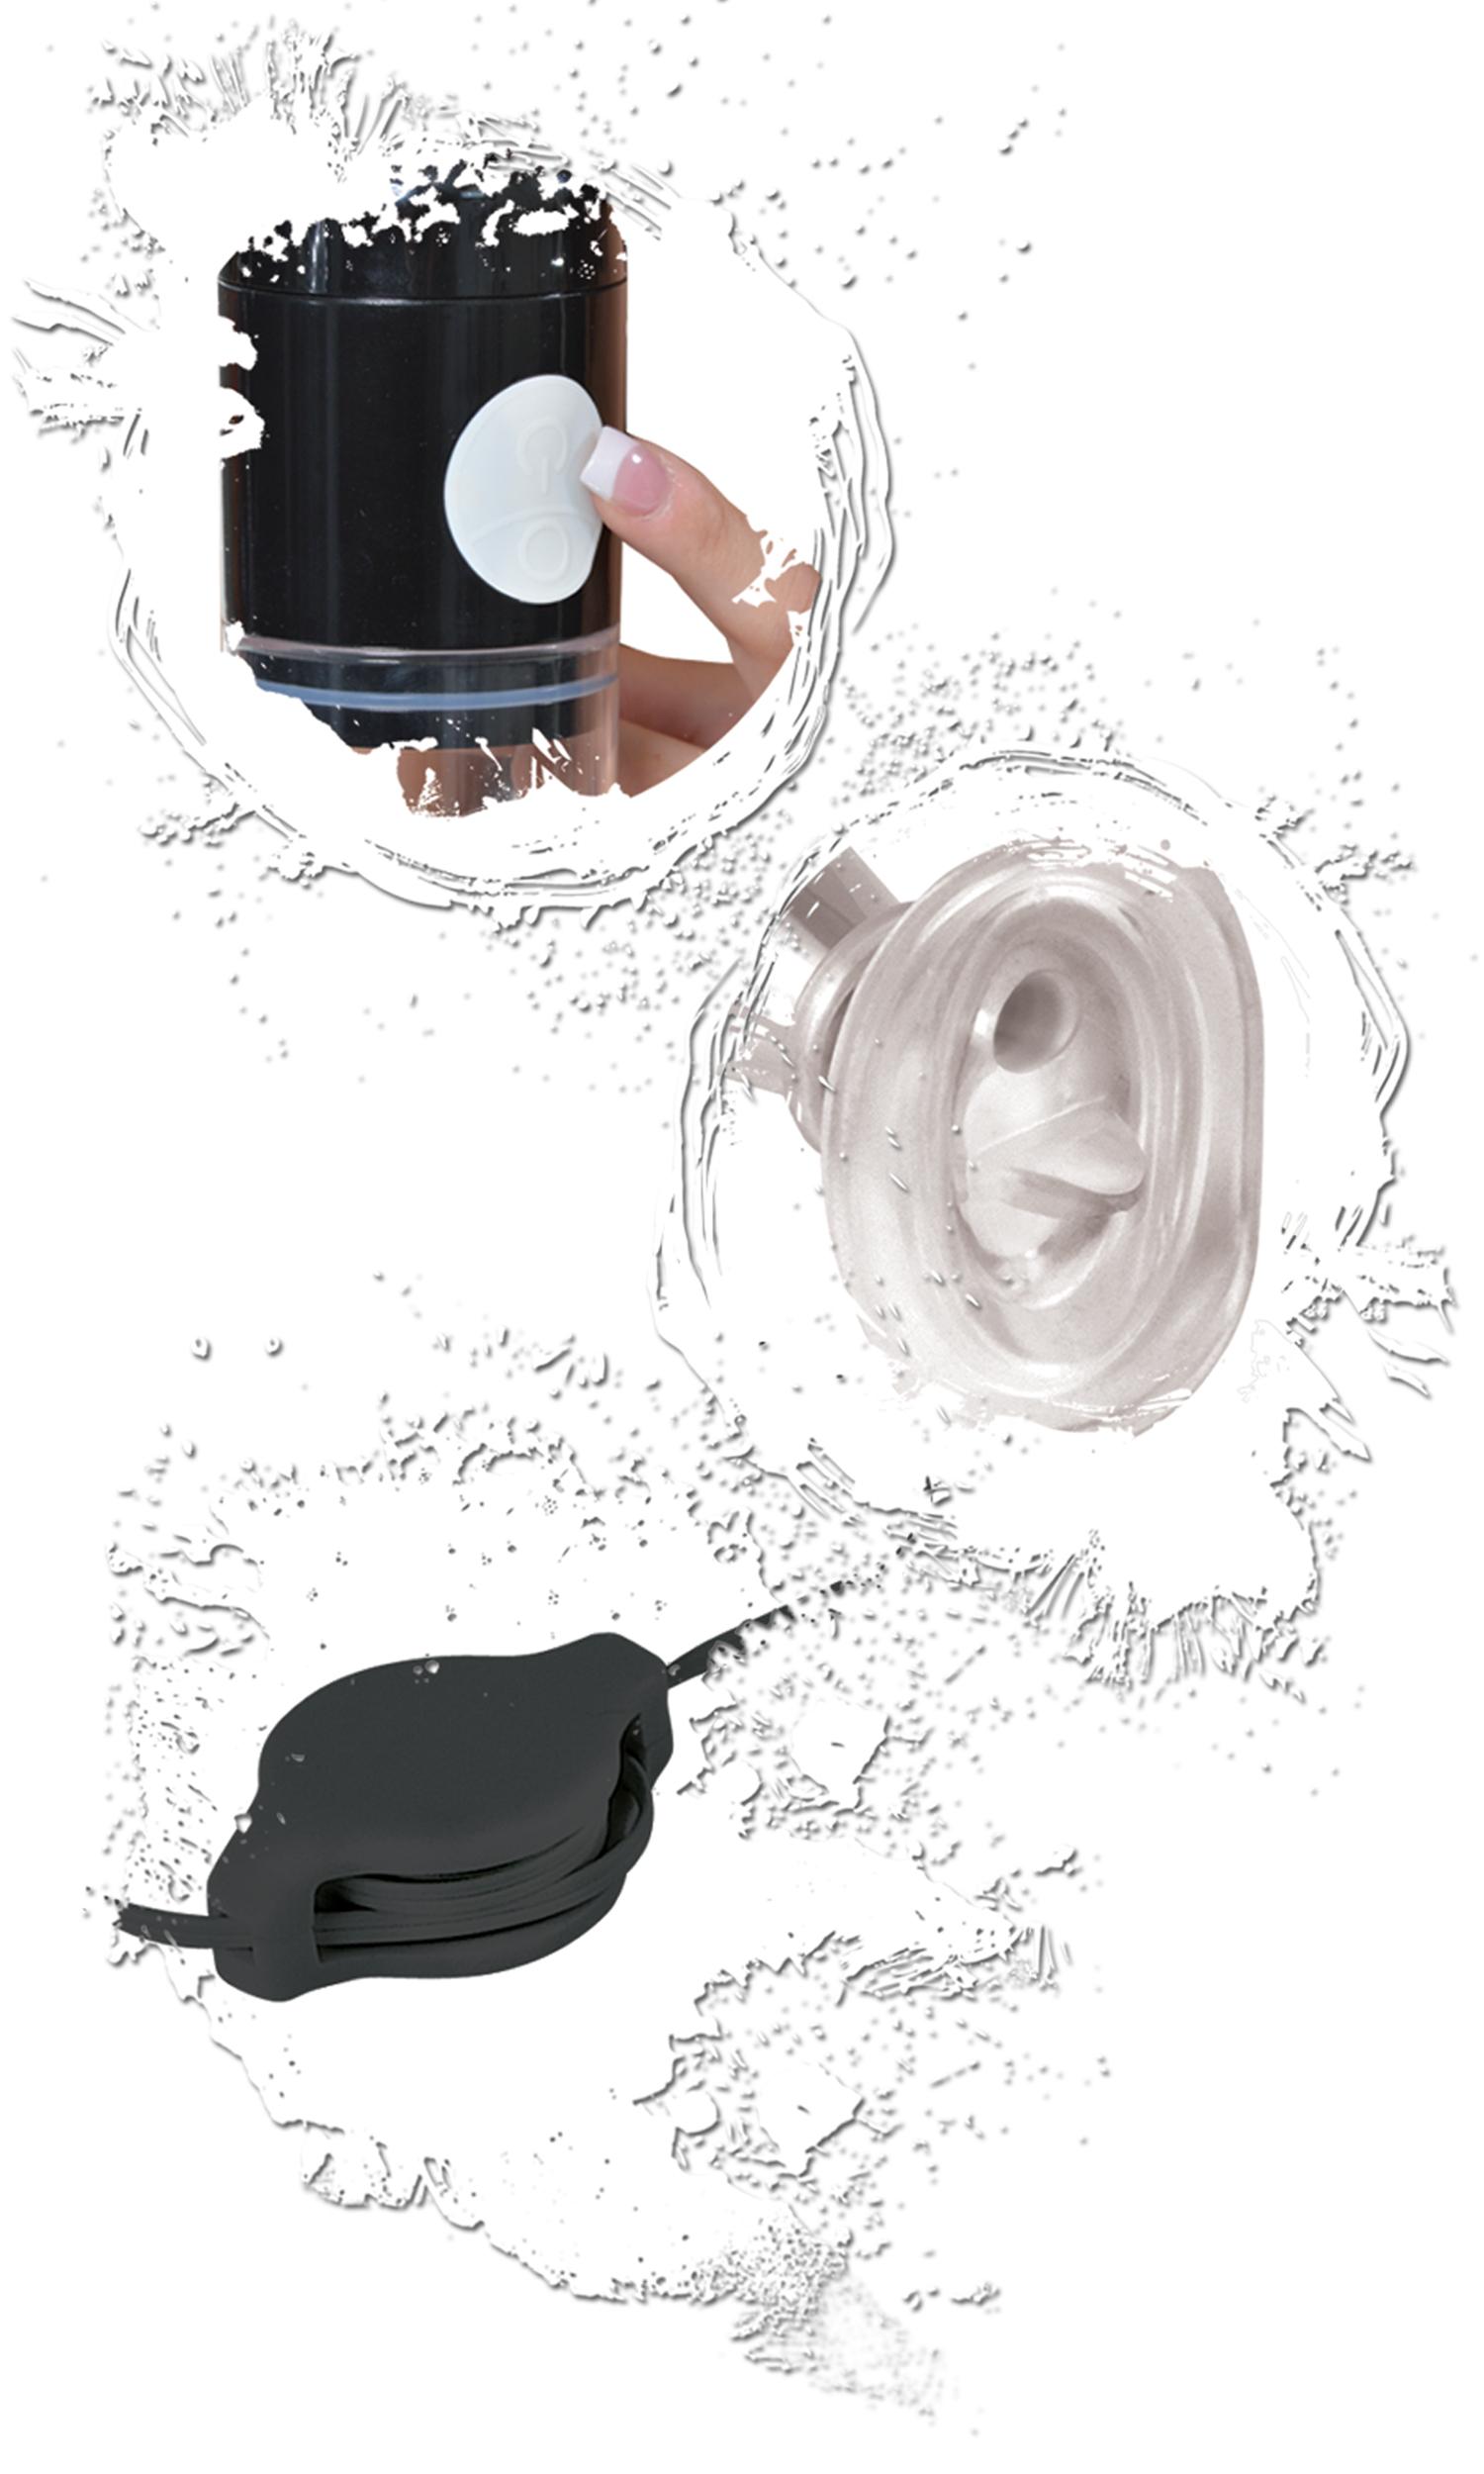 FETISH FANTASY EXTREME CLIT & TIT POWER PUMP